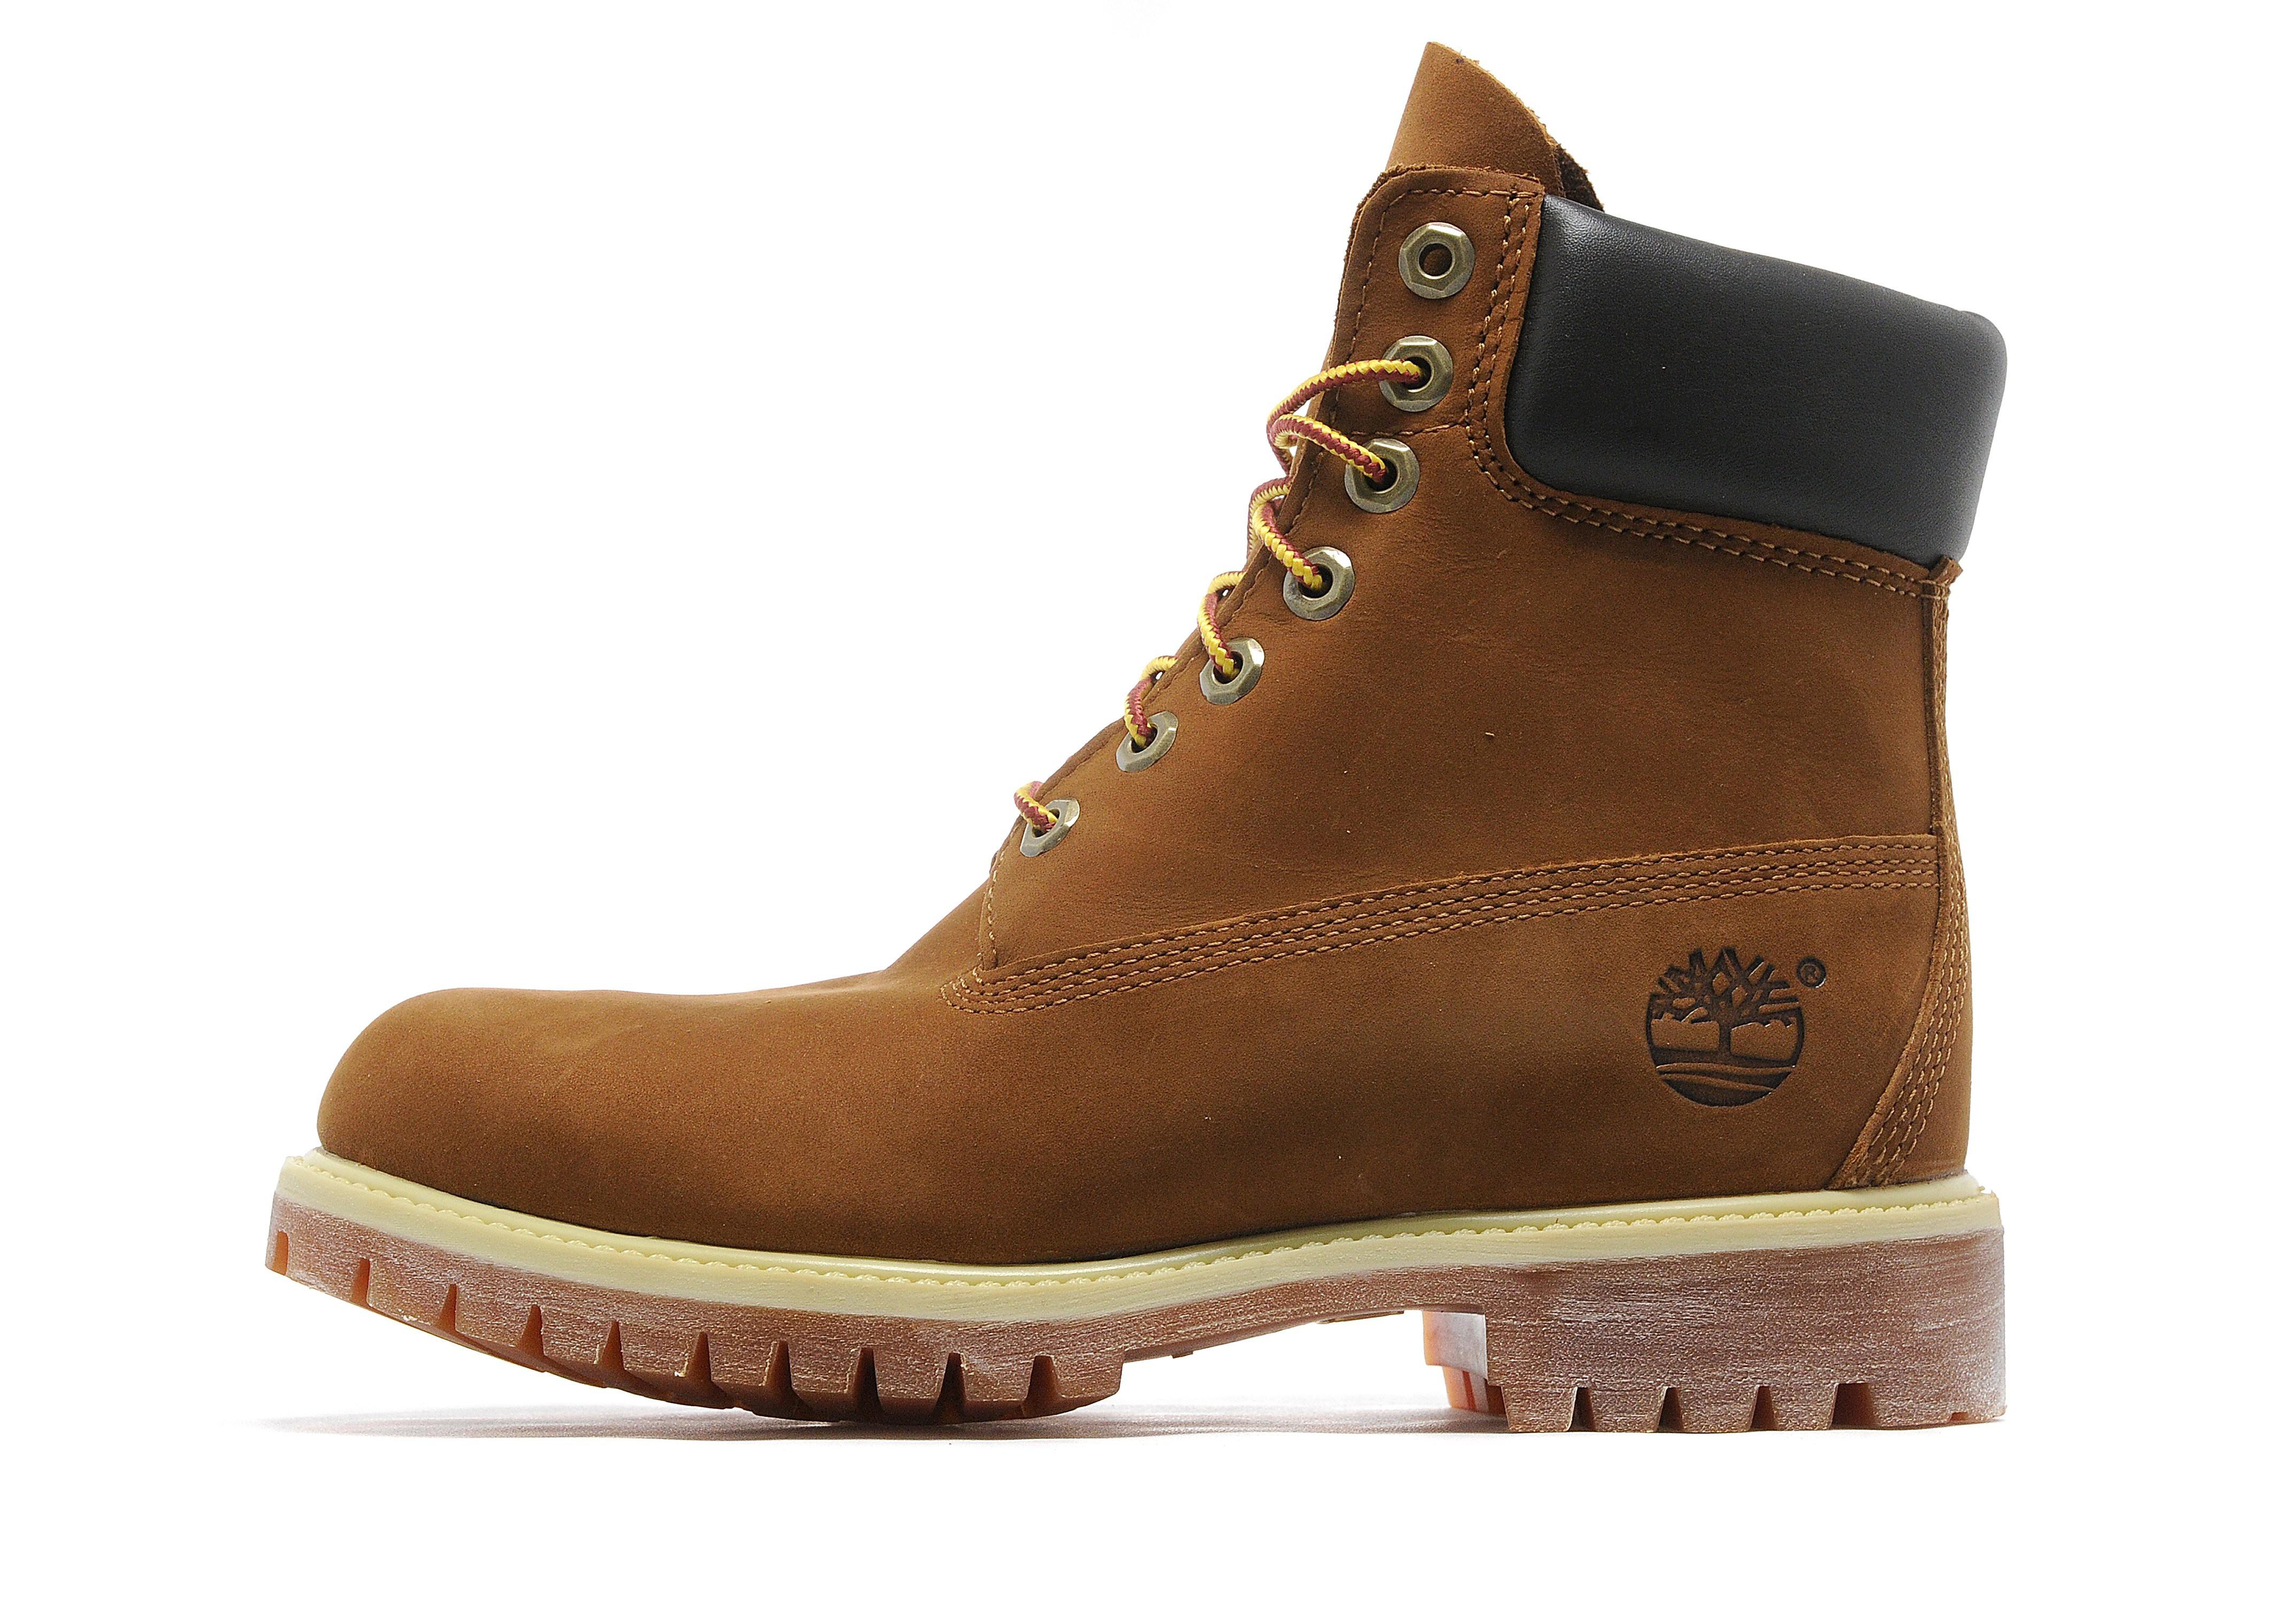 Timberland 6 inch premium støvler